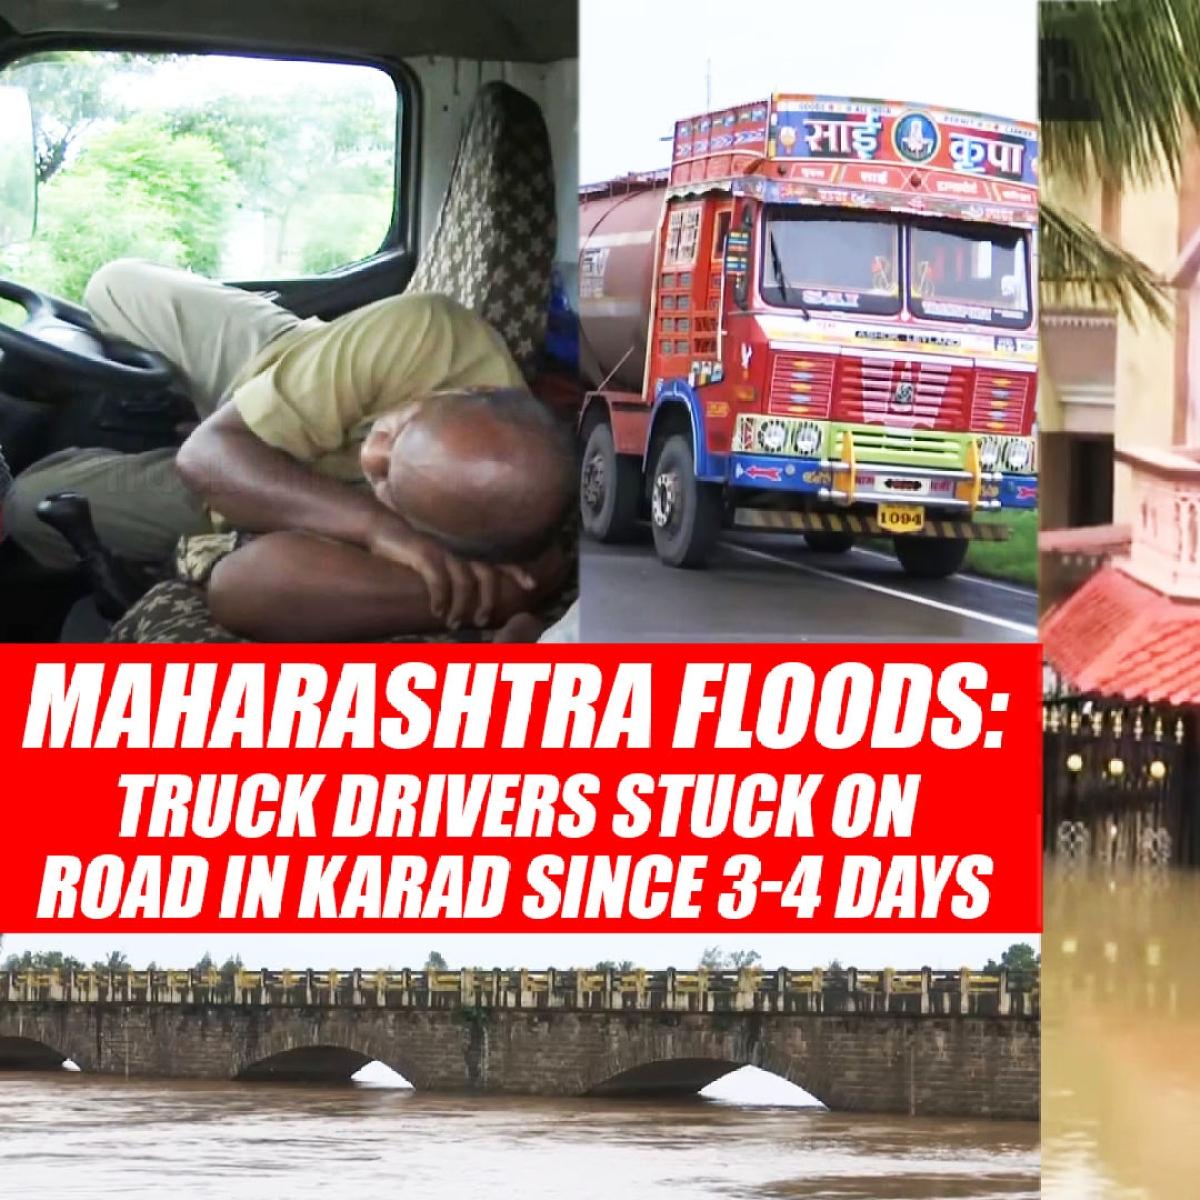 Maharashtra Floods: Truck Drivers Stuck On Road In Karad Since 3-4 Days